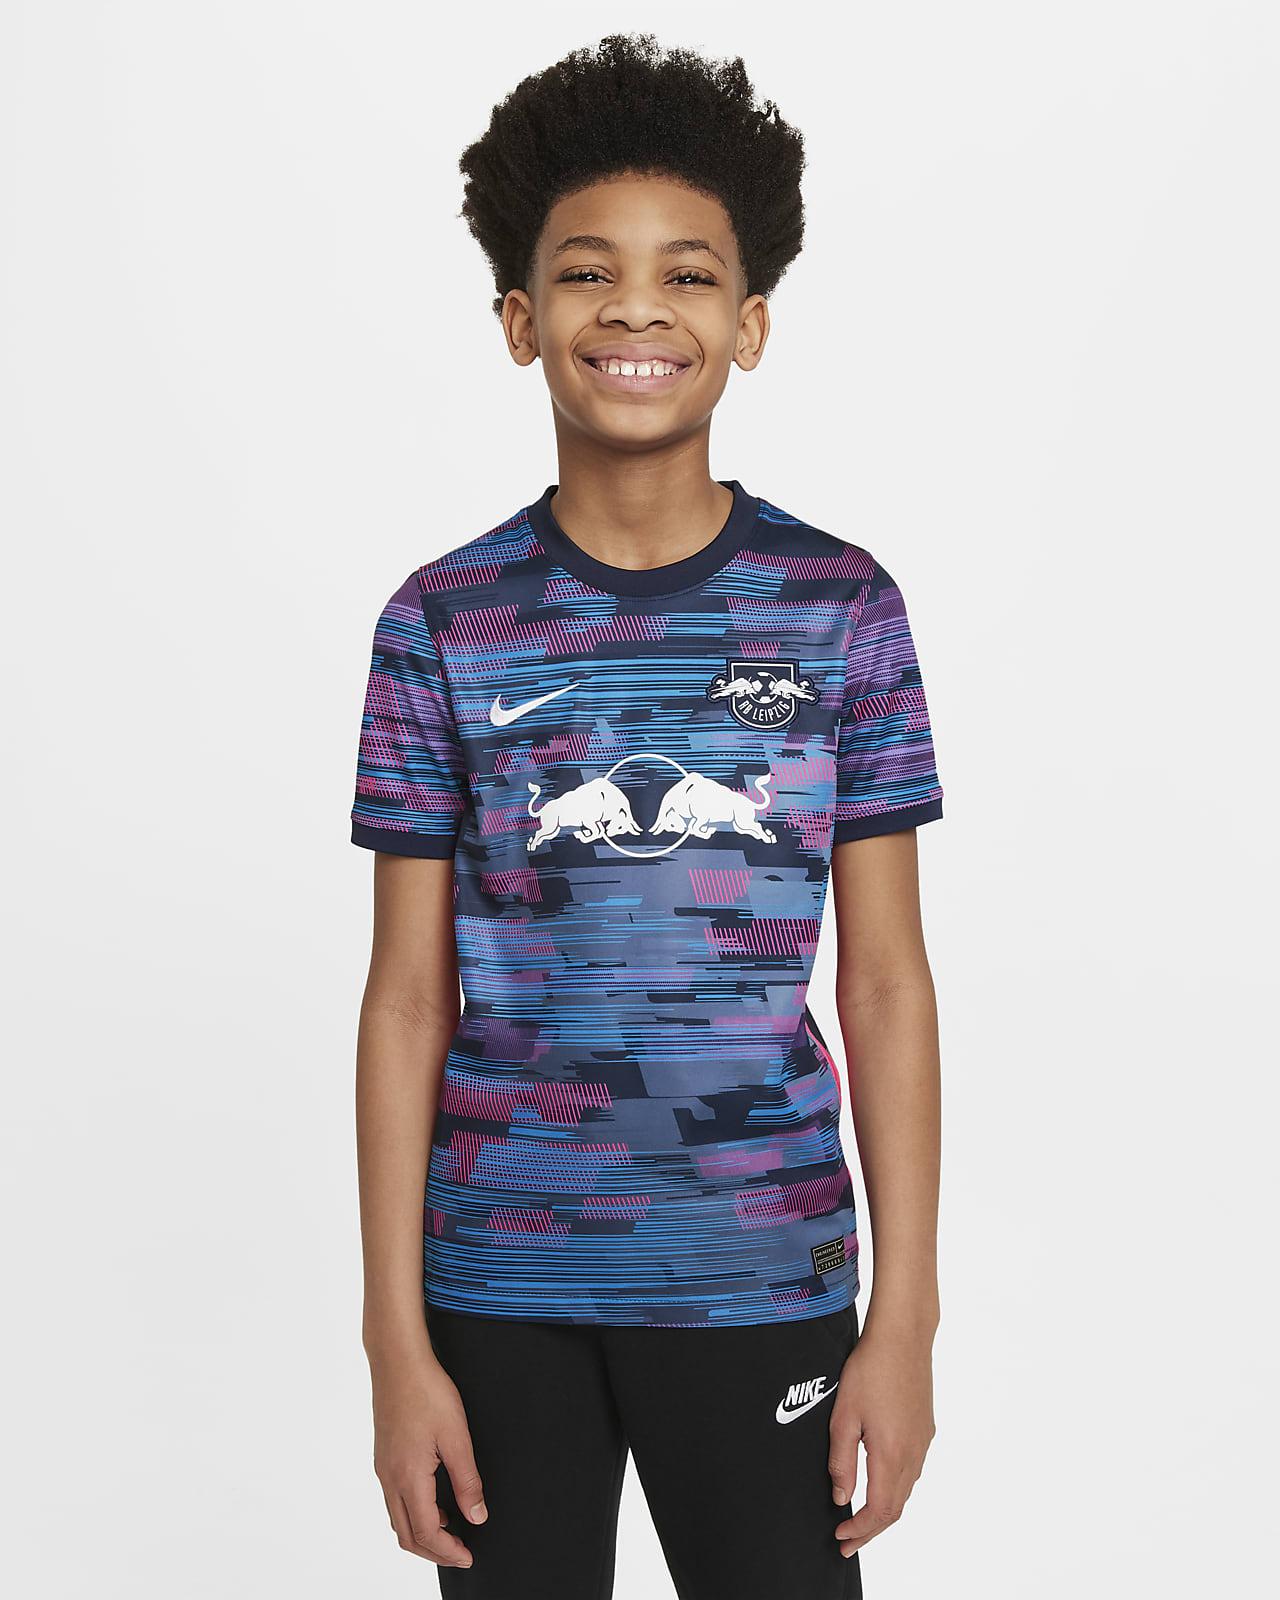 RB Leipzig 2021/22 Stadium Third Older Kids' Nike Dri-FIT Football Shirt